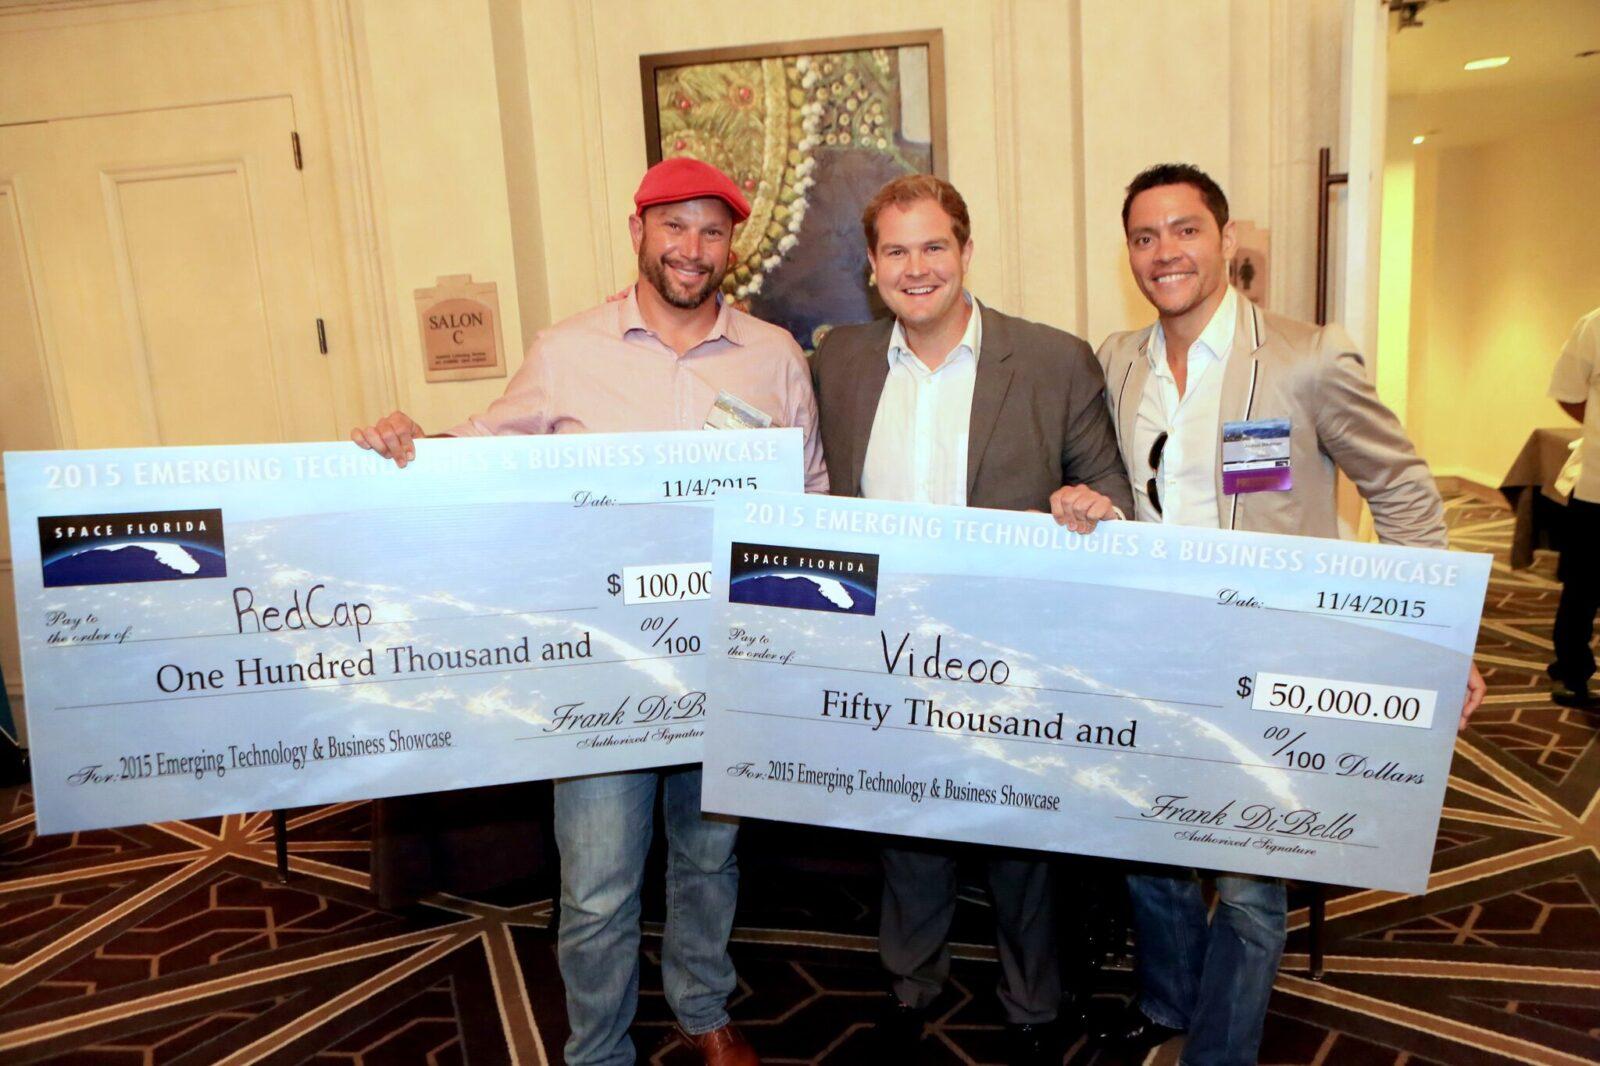 2015 Emerging Tech & Business Showcase Winner